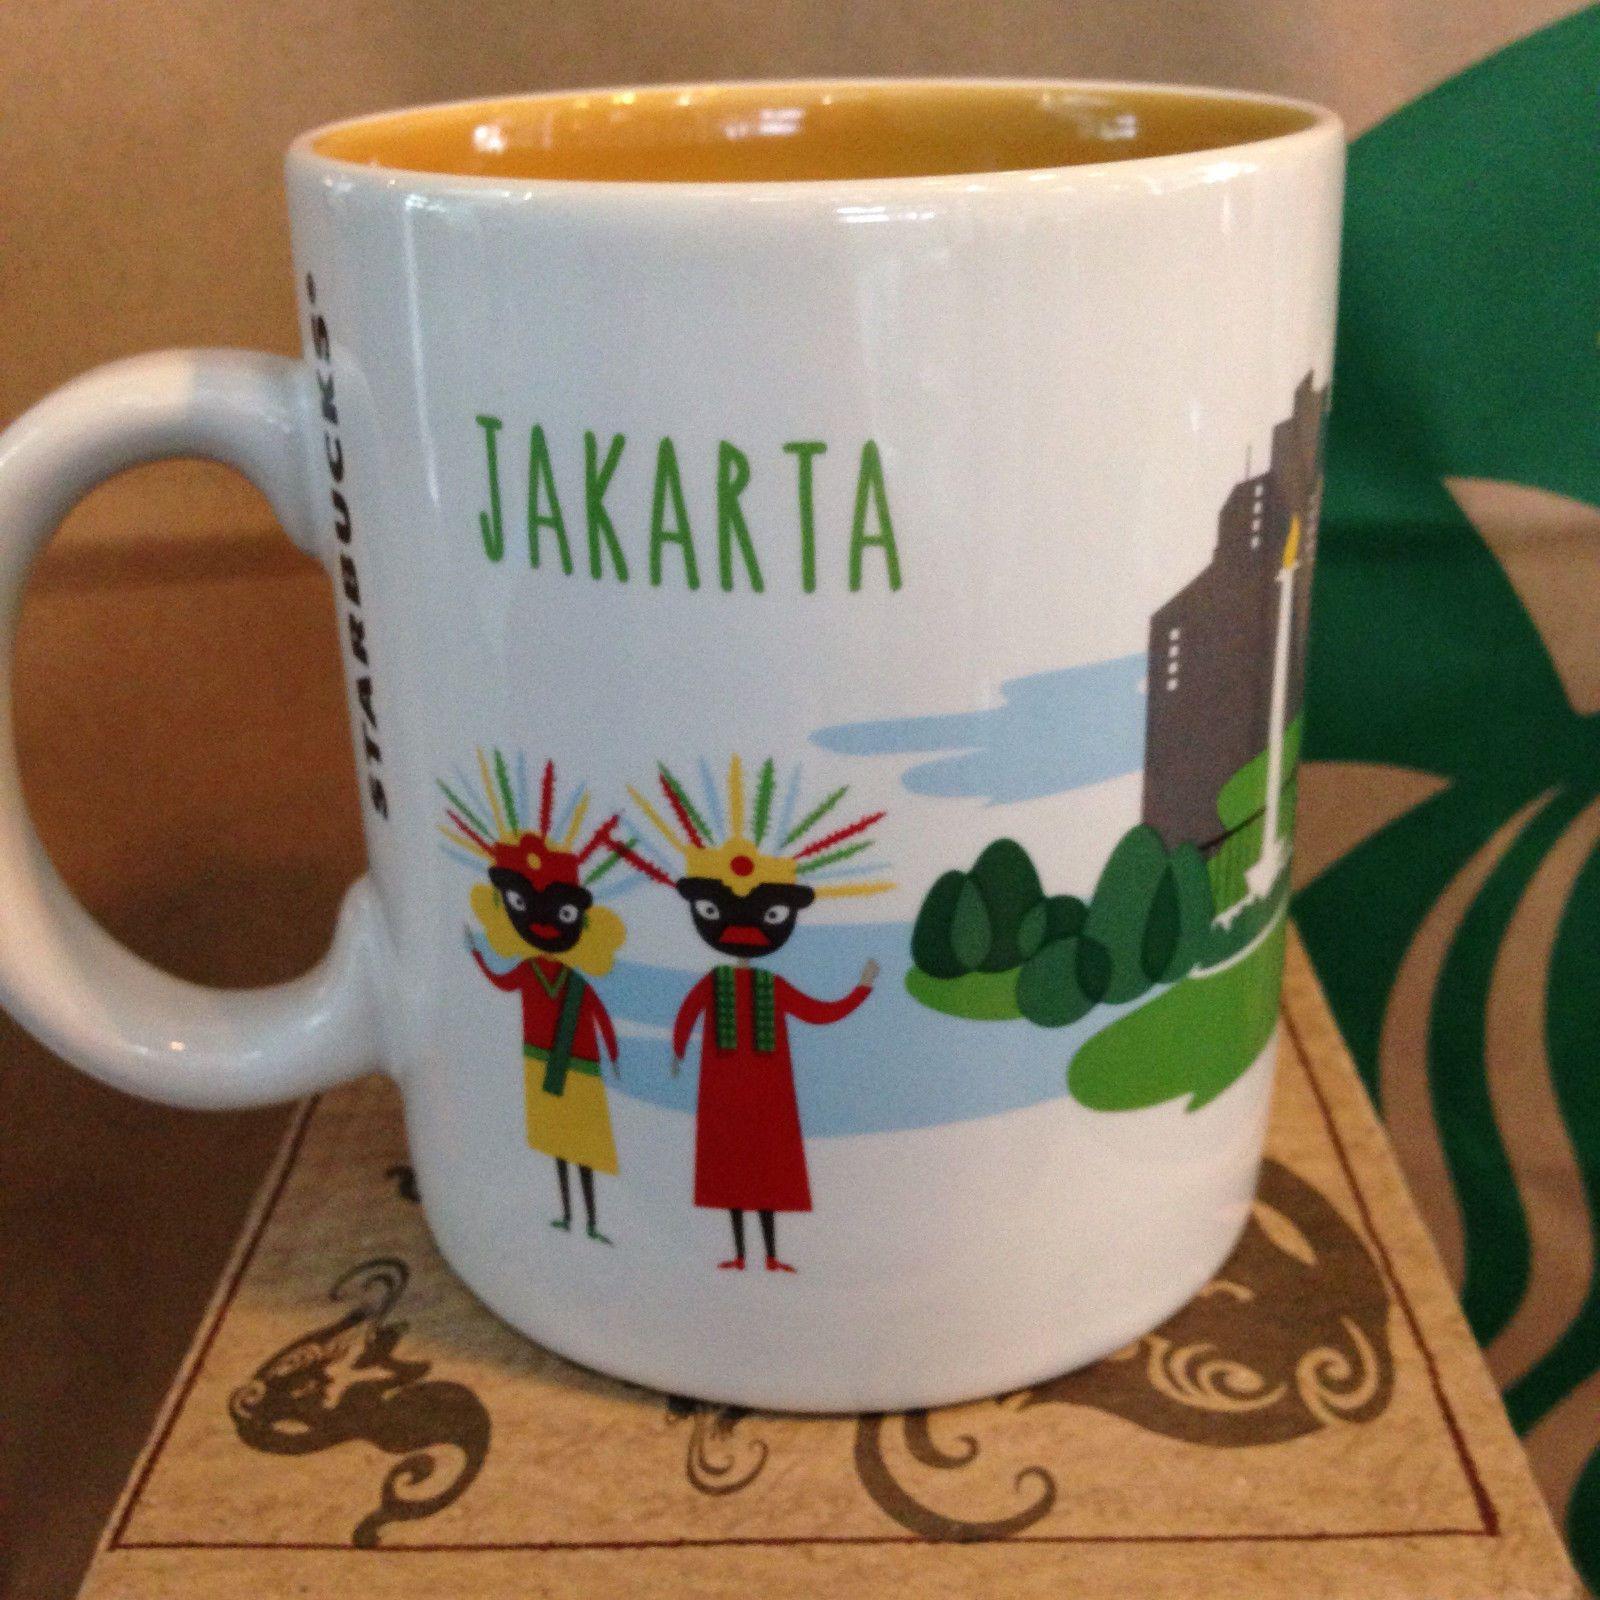 Starbucks Coffee Jakarta Indonesia New City Mug 16oz Ebay Mugs Starbucks Mugs Starbucks Advertising